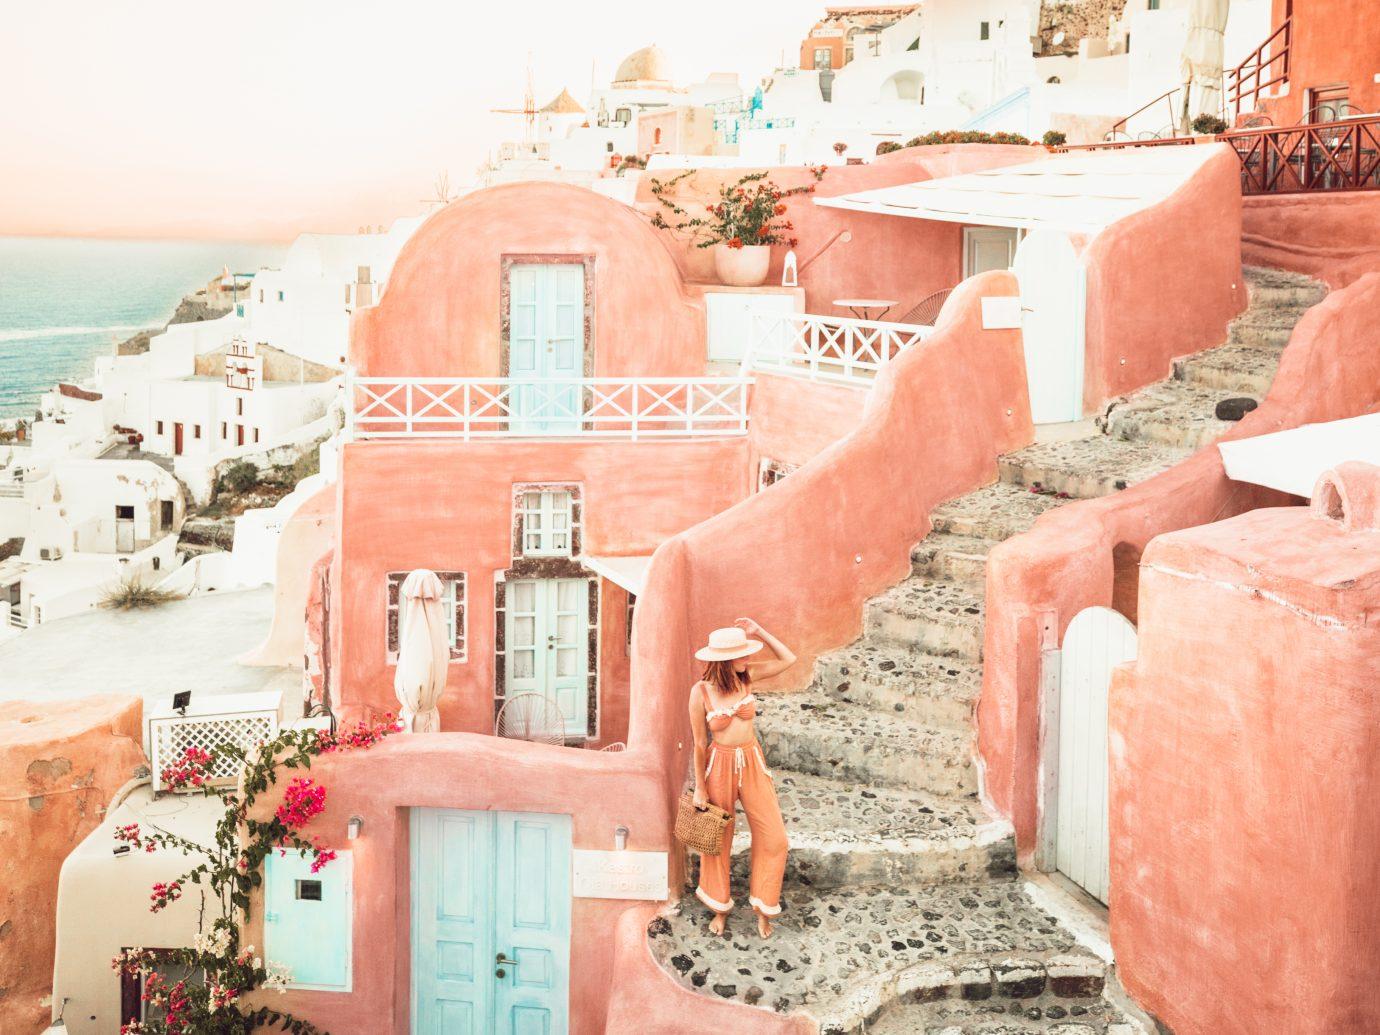 View of Puglia Italy